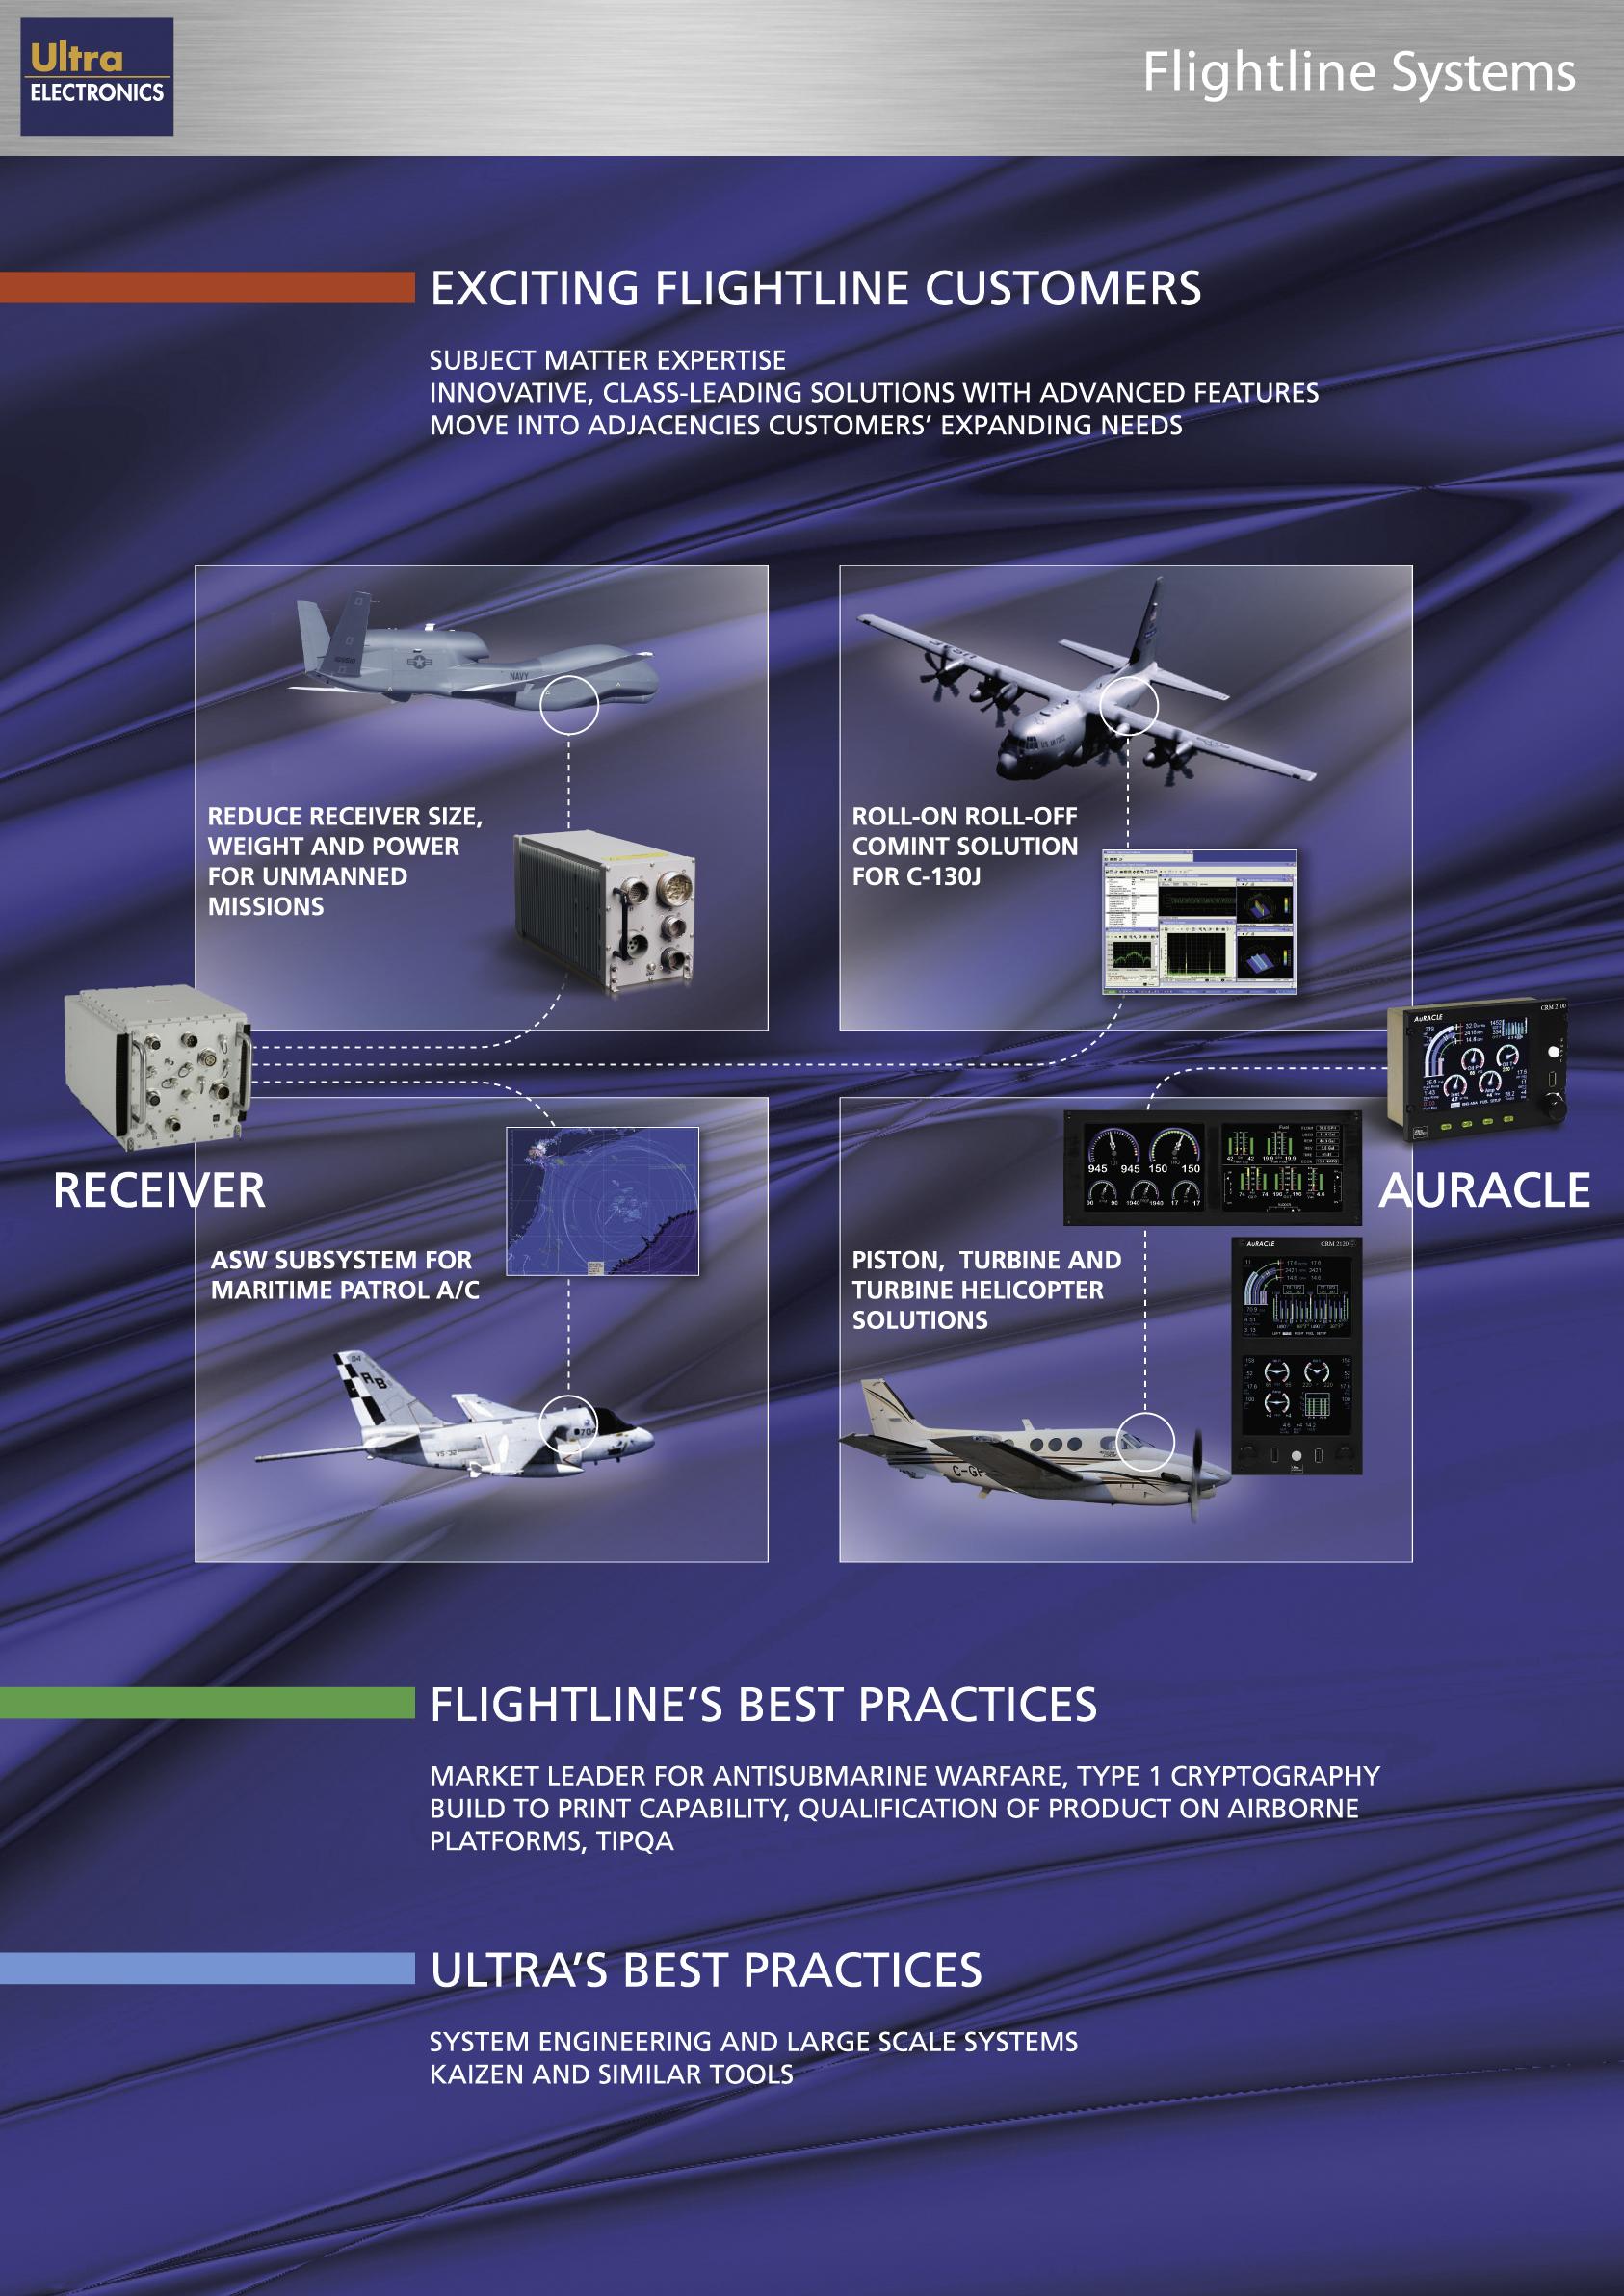 2010 Flightline BLC Poster 2.jpg